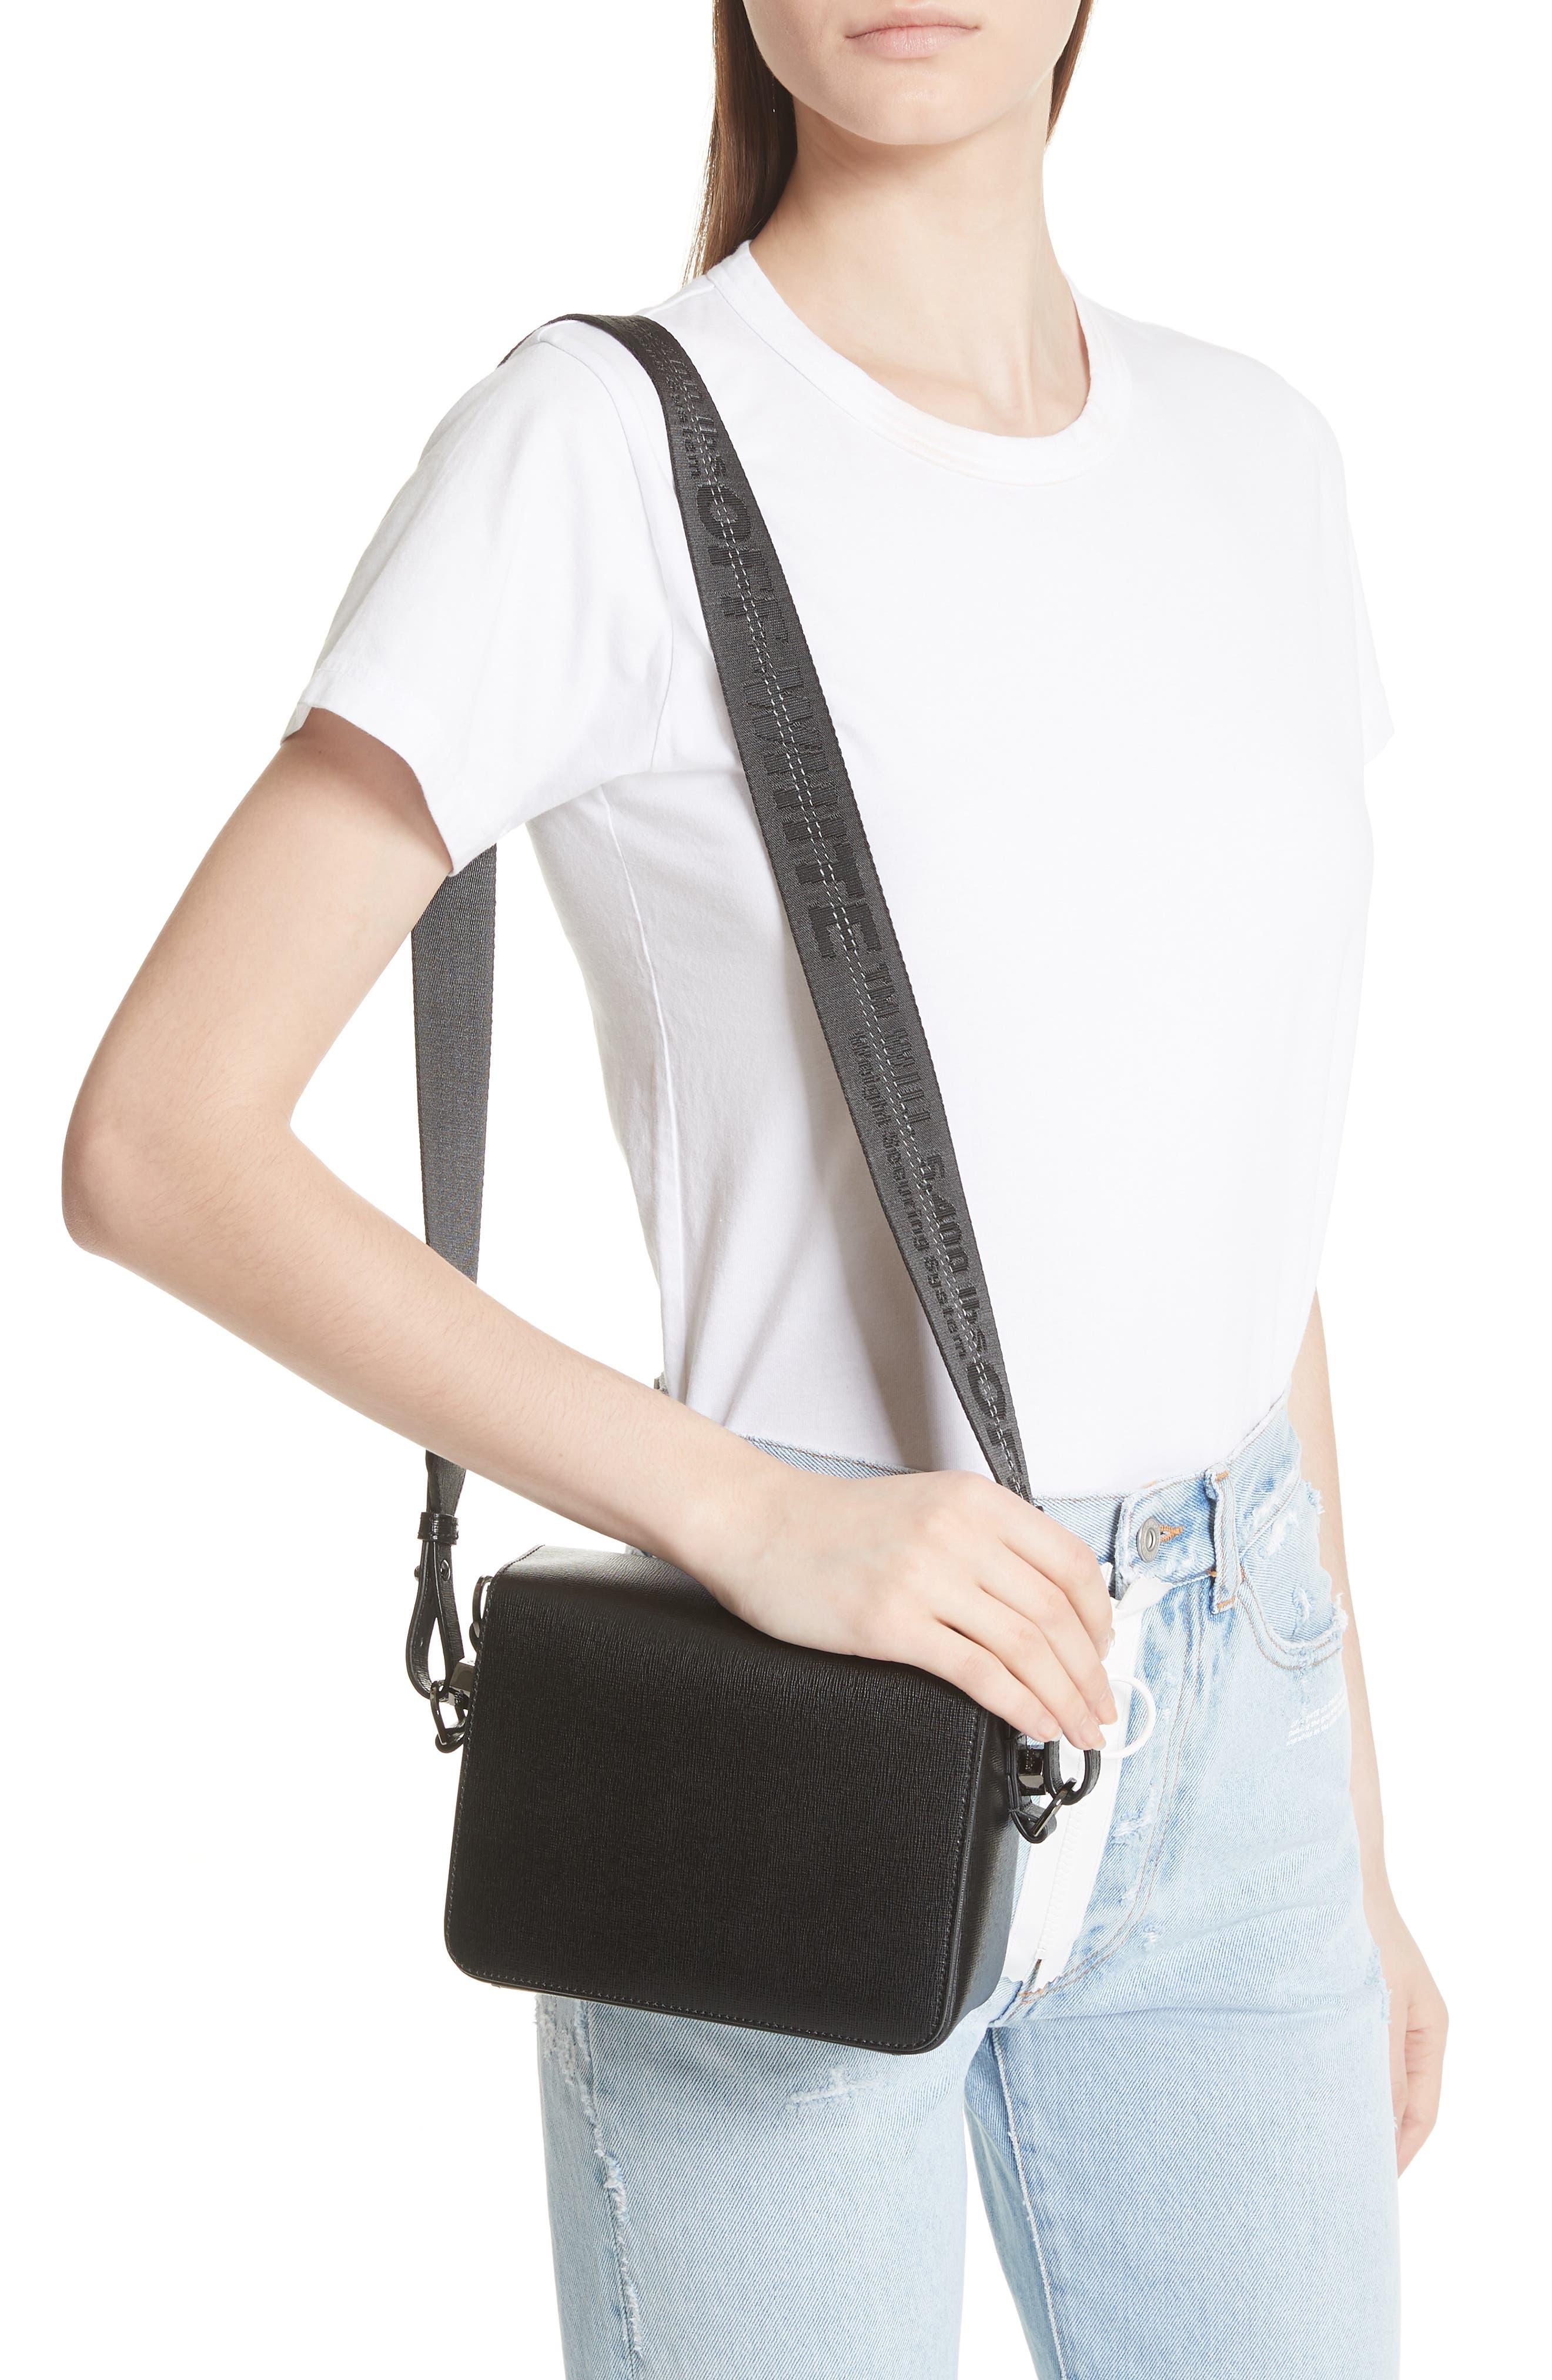 Binder Clip Leather Flap Bag,                             Alternate thumbnail 2, color,                             Black